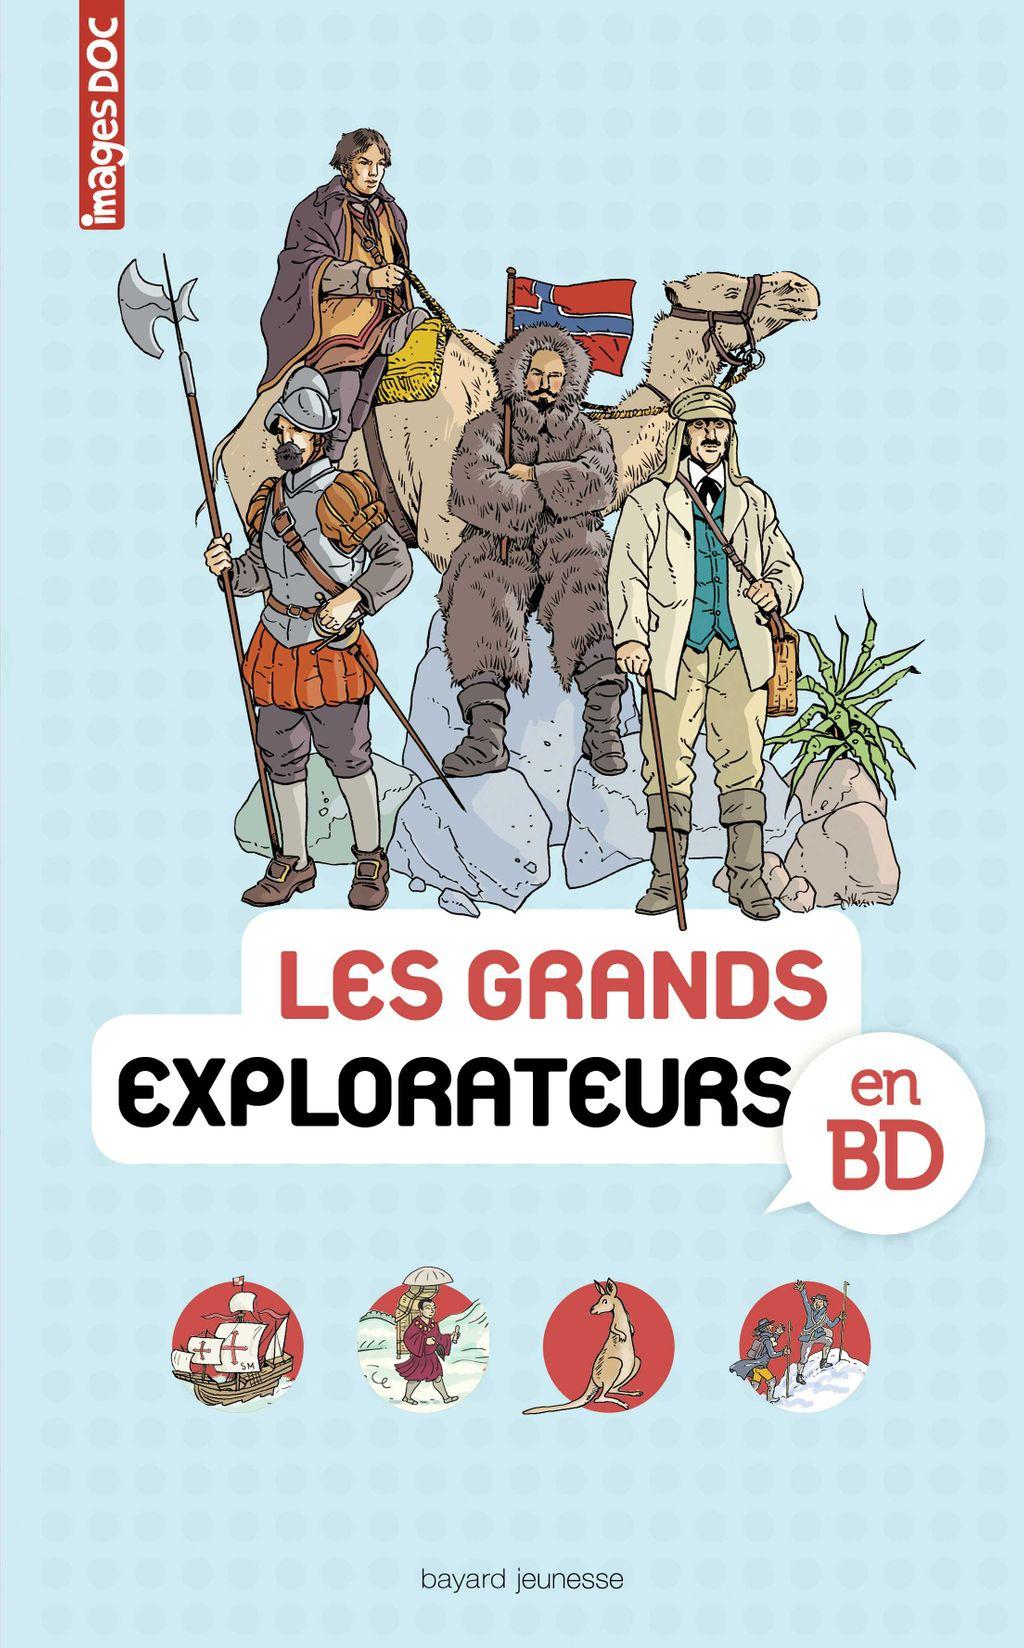 «Les grands explorateurs en BD» cover